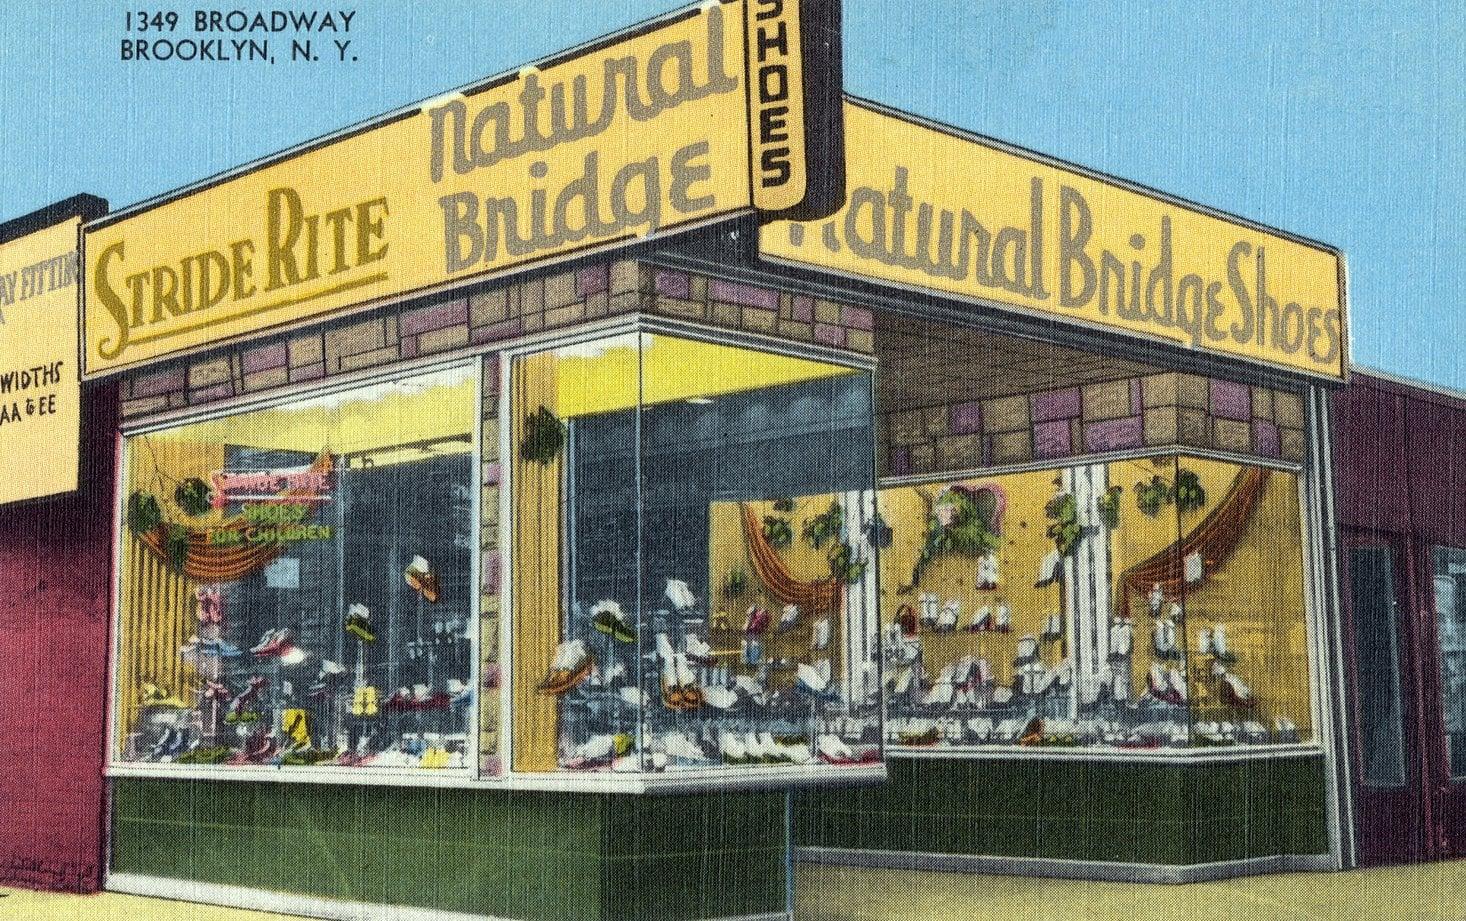 Stride Rite, Natural Bridge Shoes Brooklyn NY (1940s)